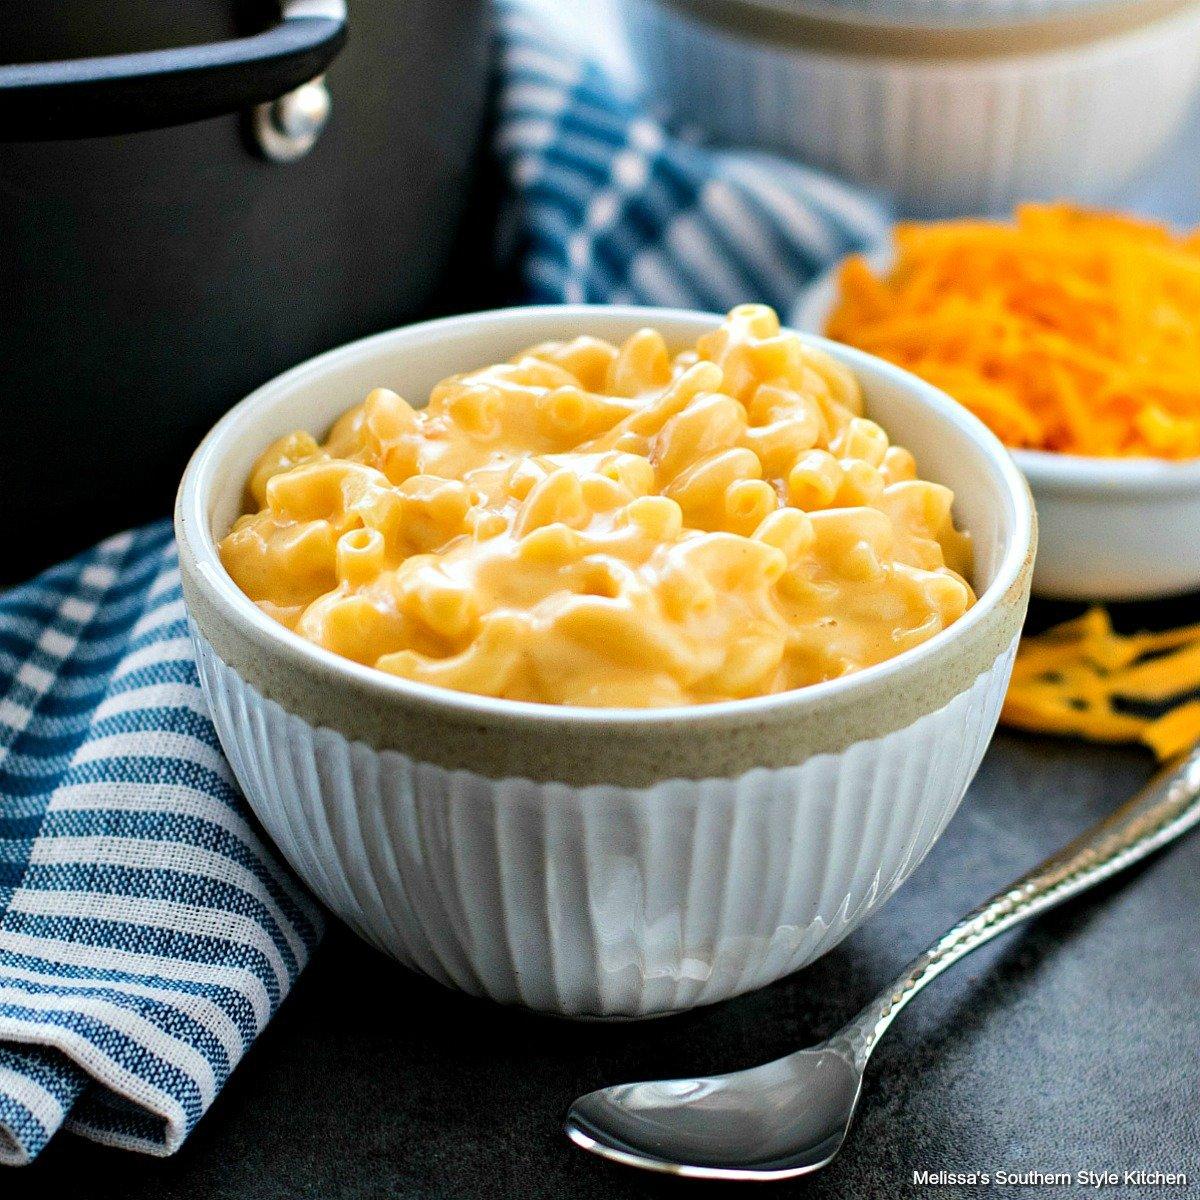 Creamy Stovetop Macaroni and Cheese